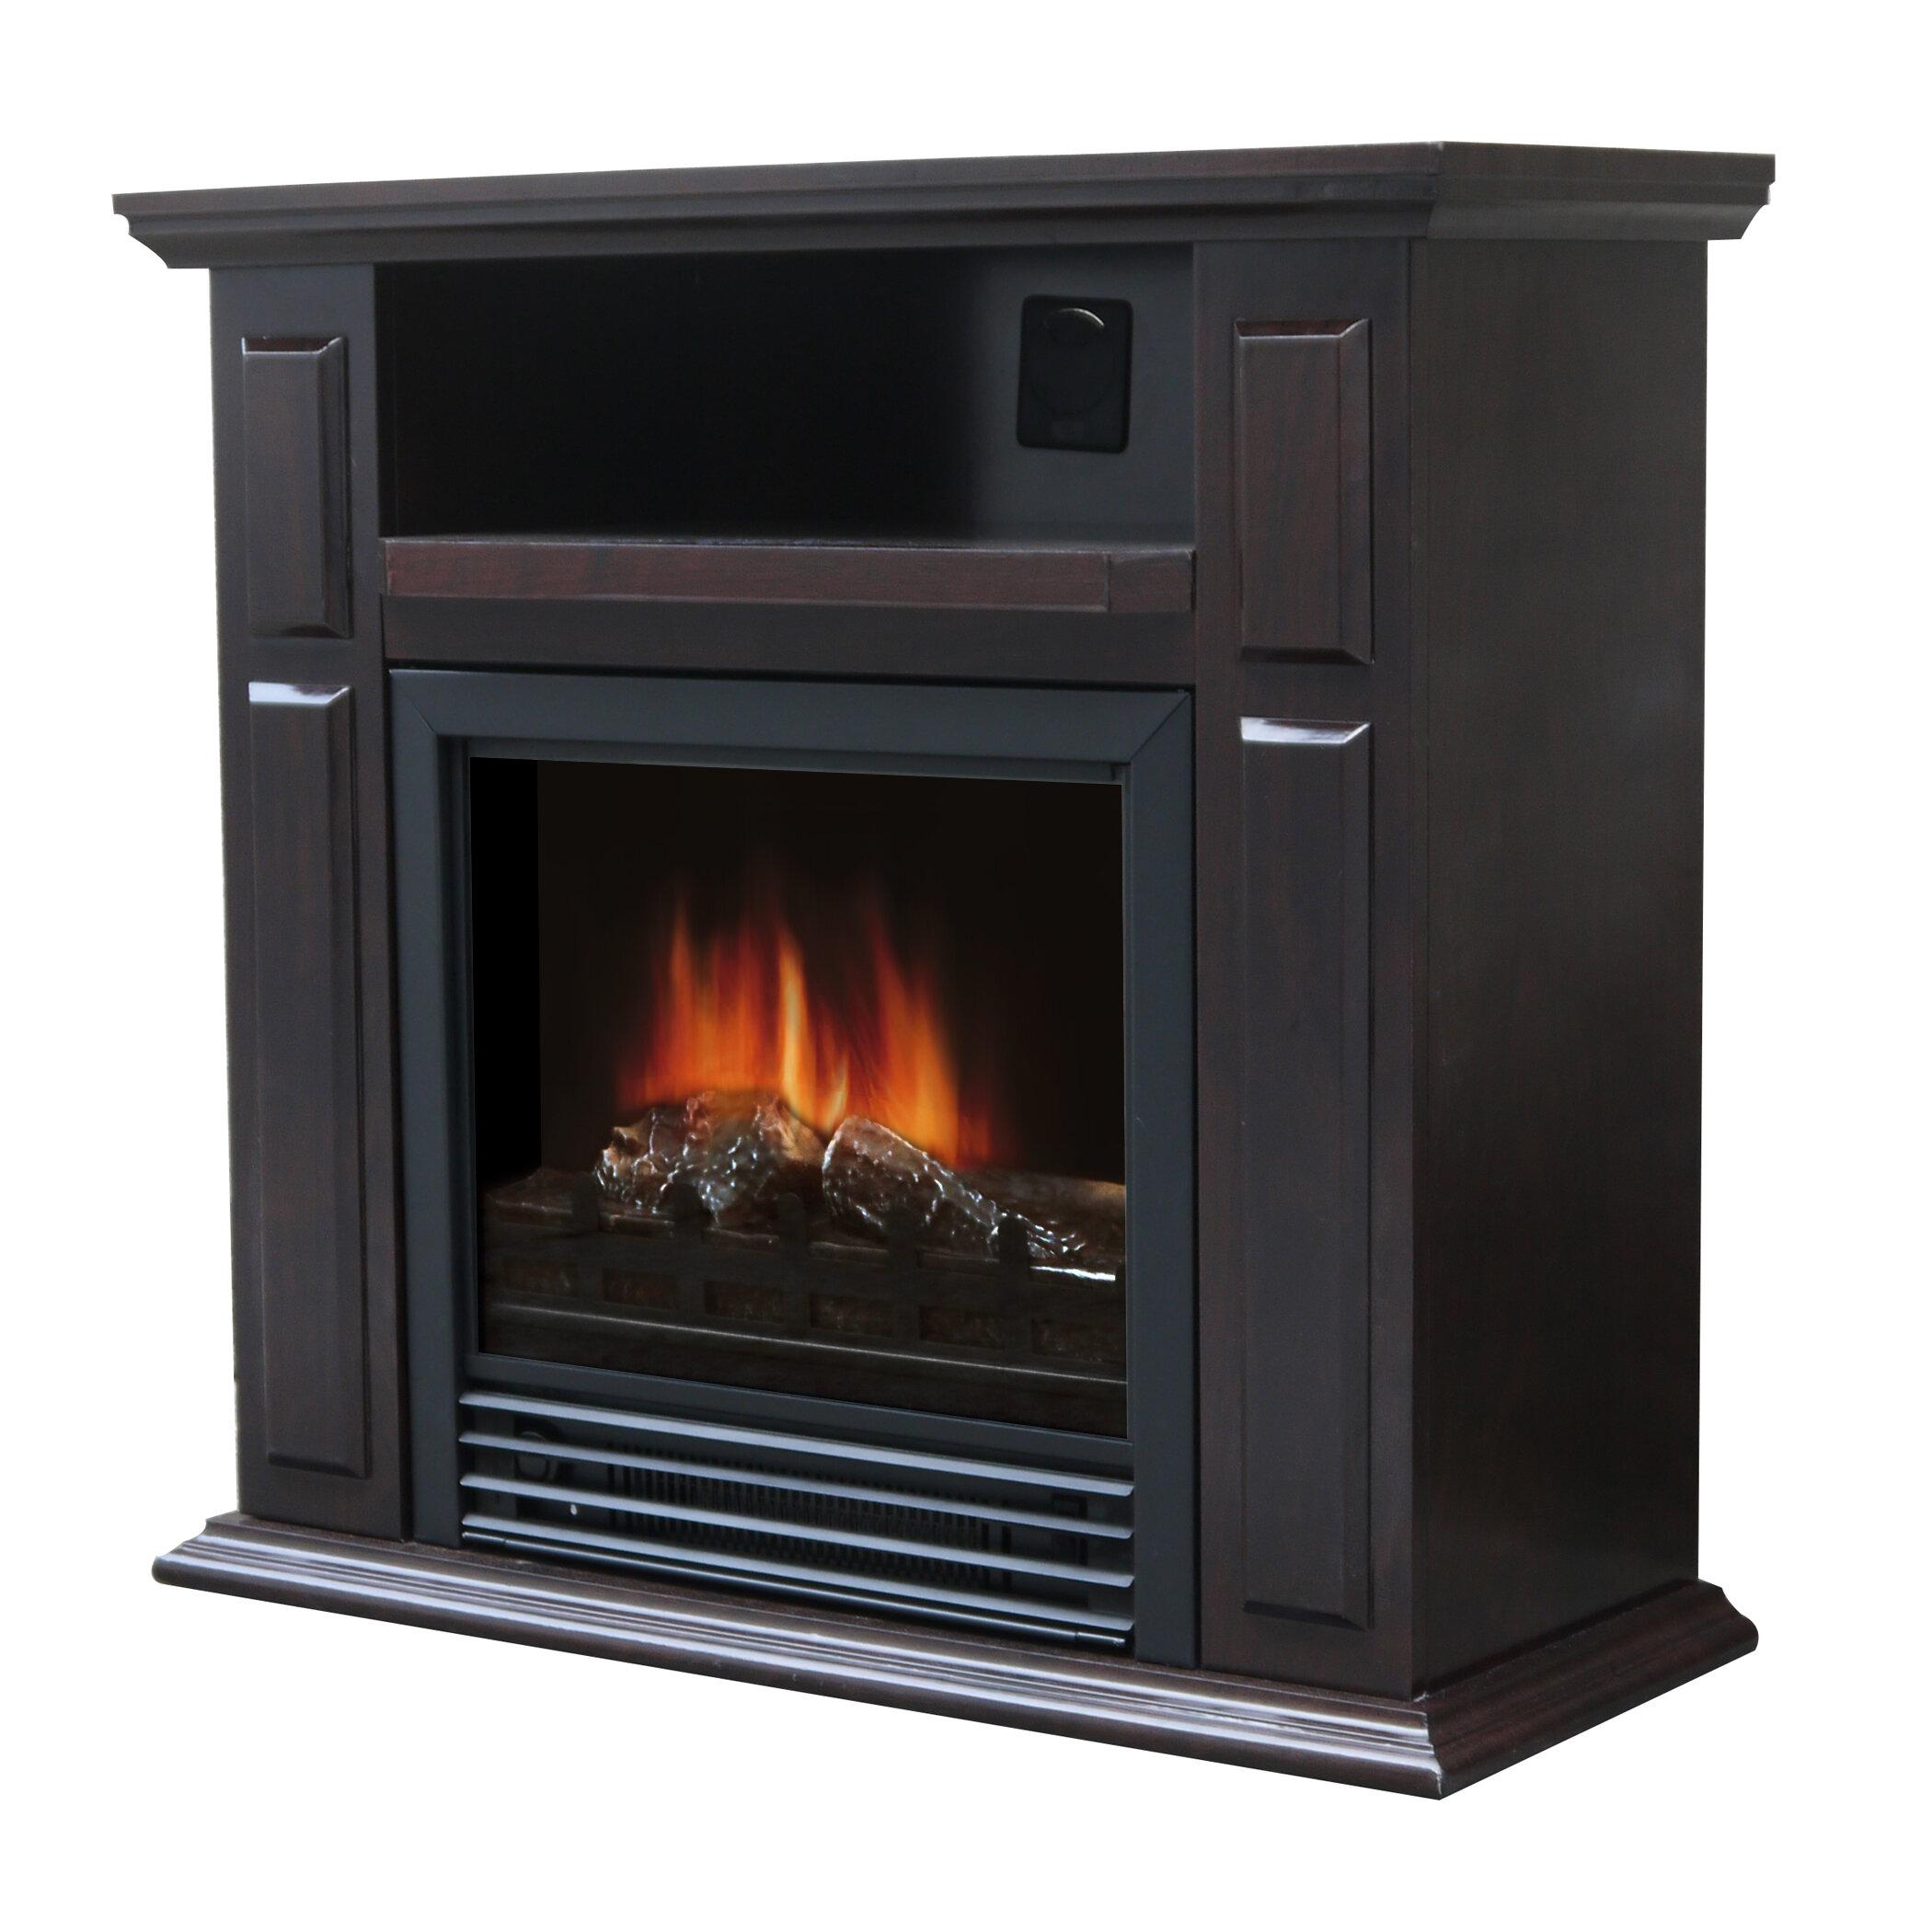 Charlton Home Wellesley Electric Fireplace Reviews Wayfair